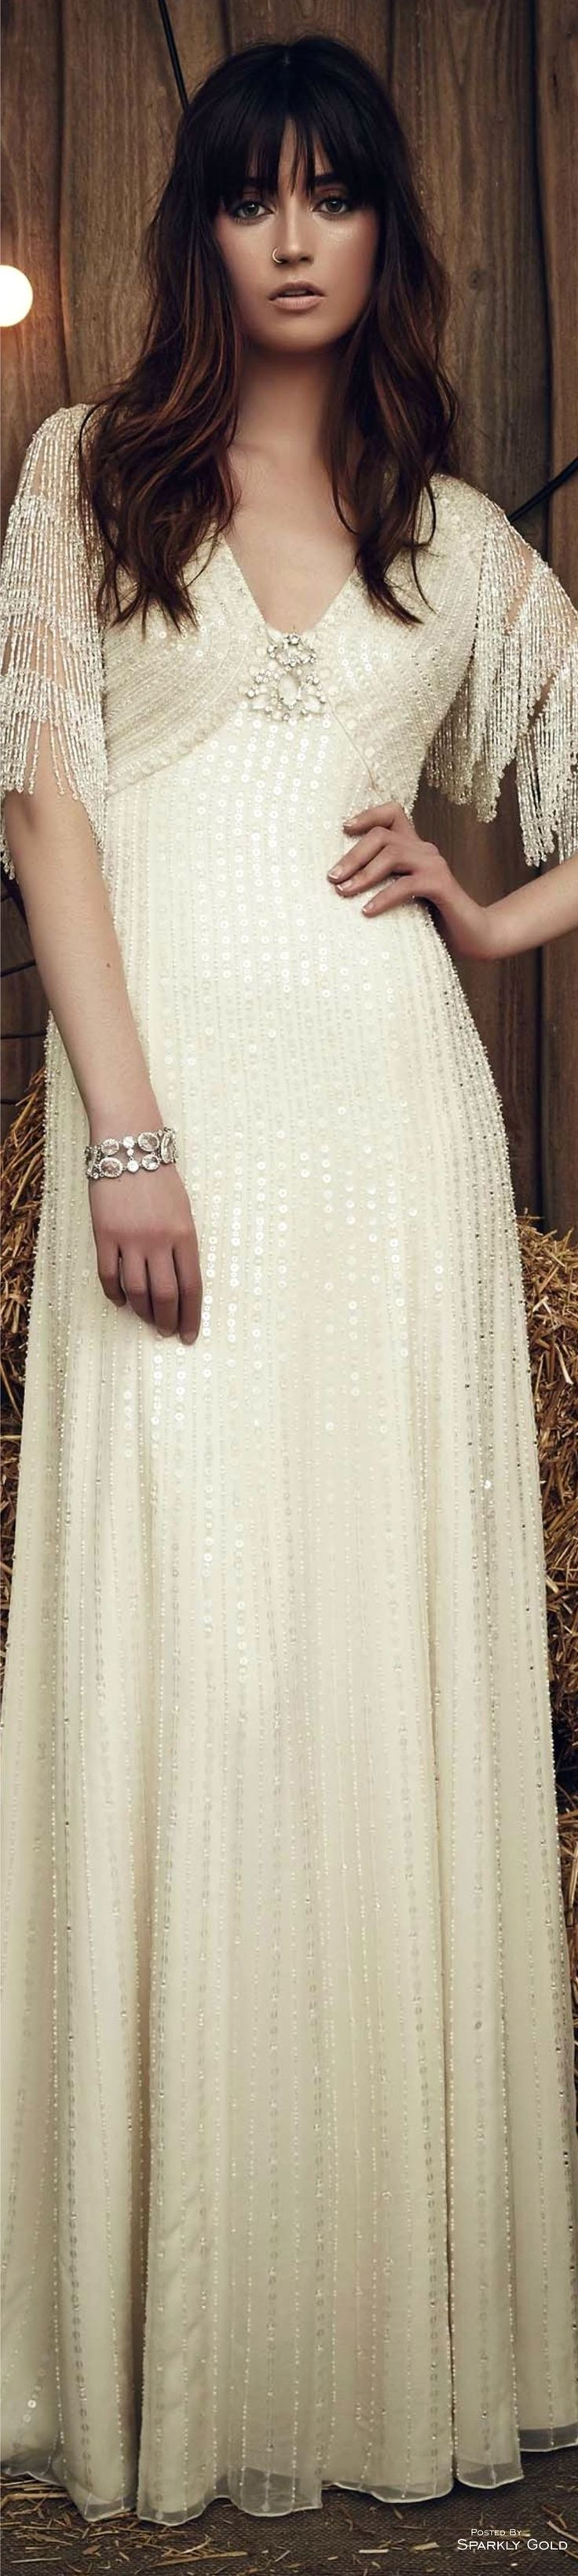 #Farbbberatung #Stilberatung #Farbenreich mit www.farben-reich.com Jenny Packham Spring 2017 Bridal